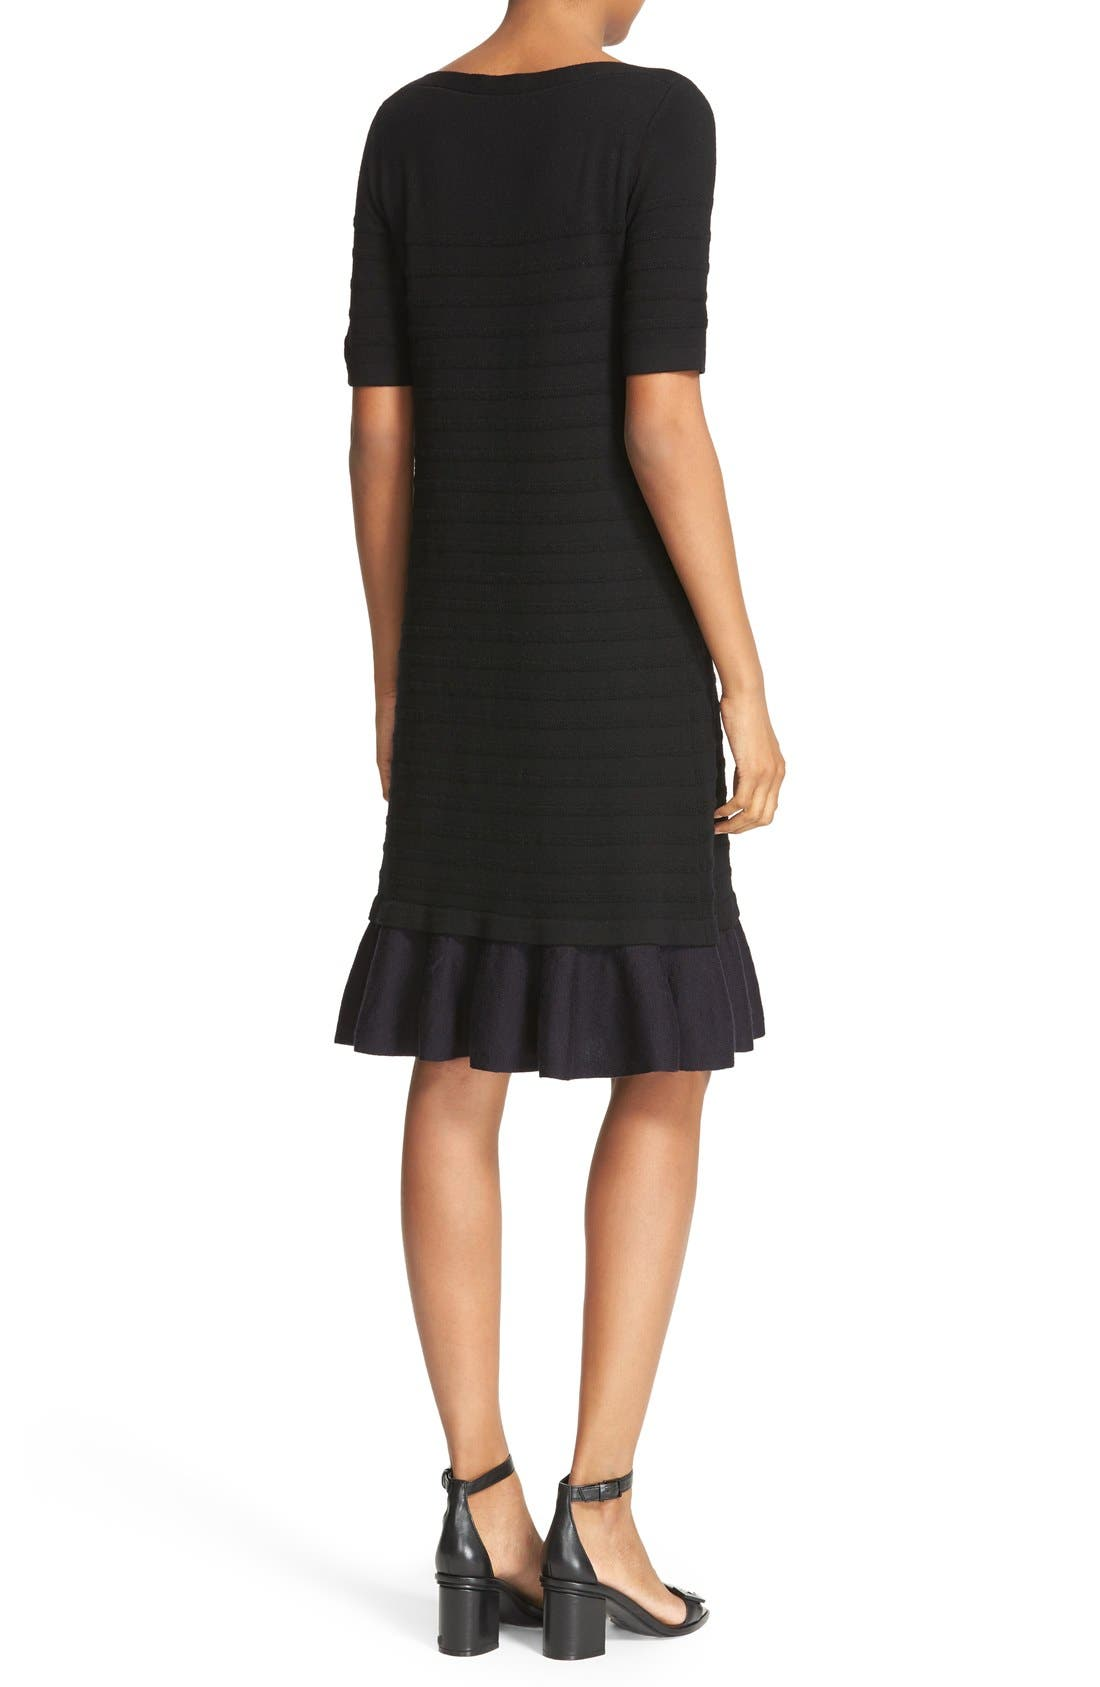 Alternate Image 2  - Tory Burch Giselle Textured Merino Wool Sweater Dress